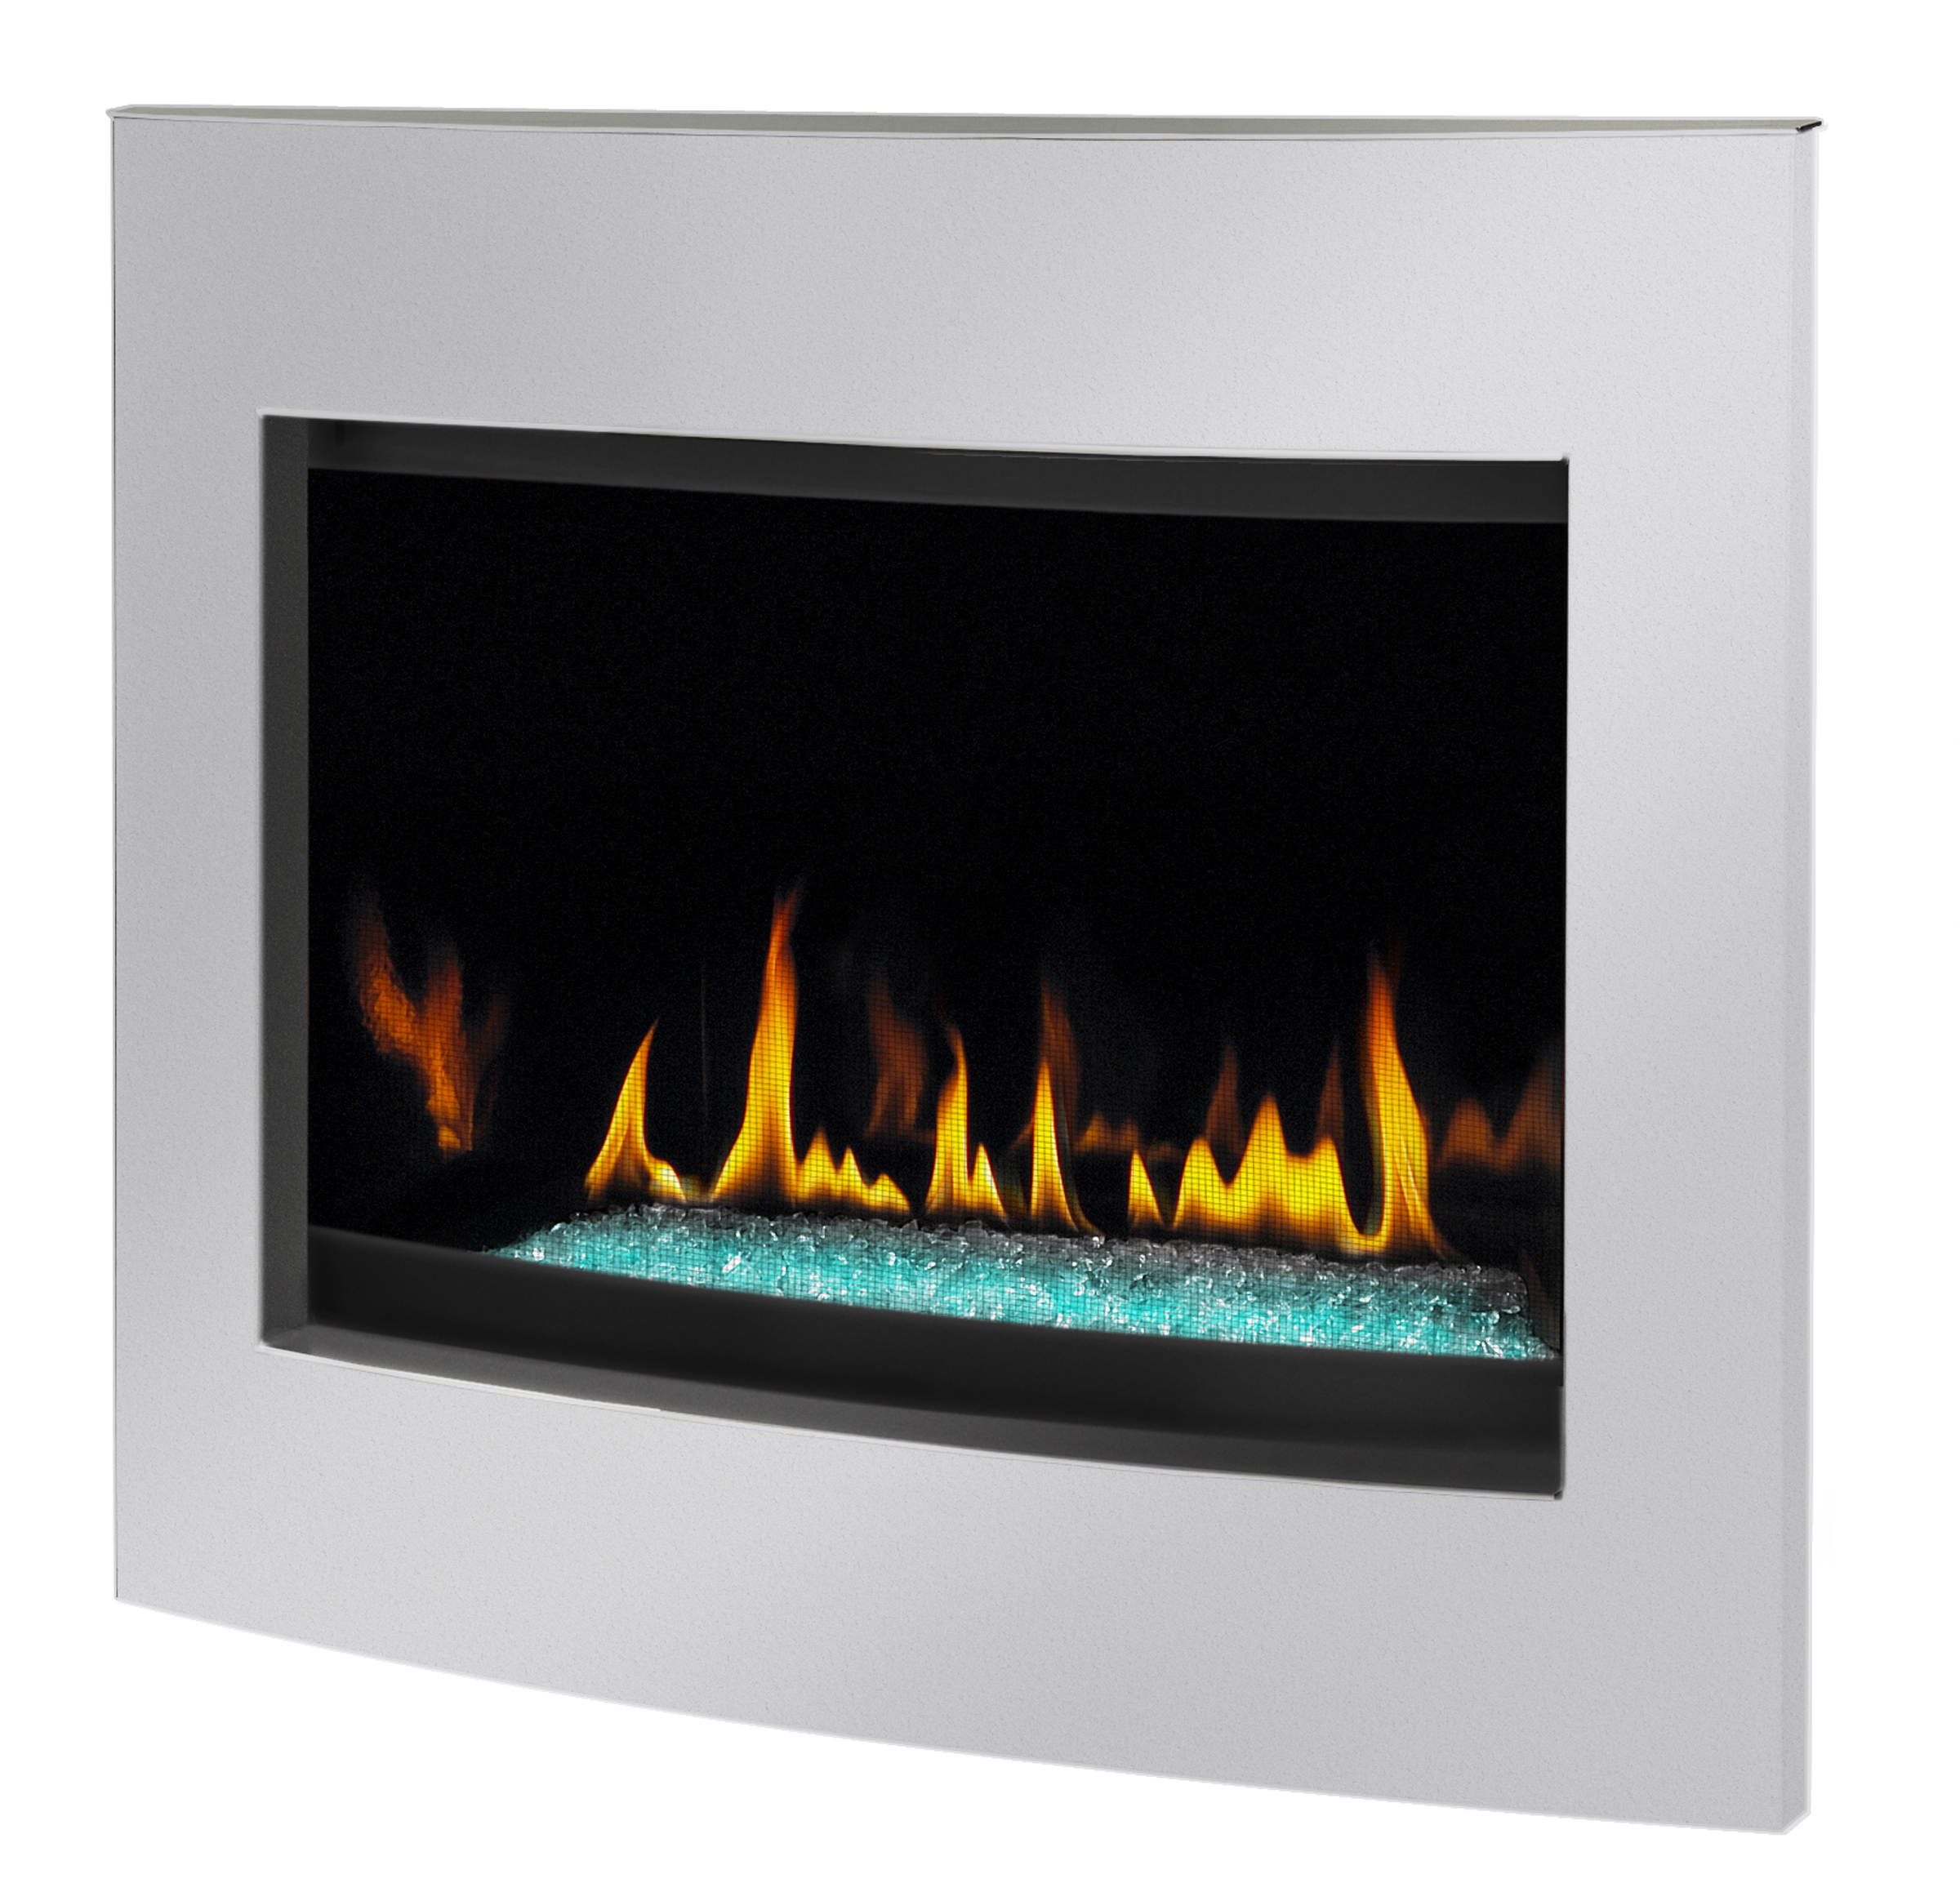 crystallo-bgd36cfg-1sb-clear-glass-angled-fireplaces.jpg